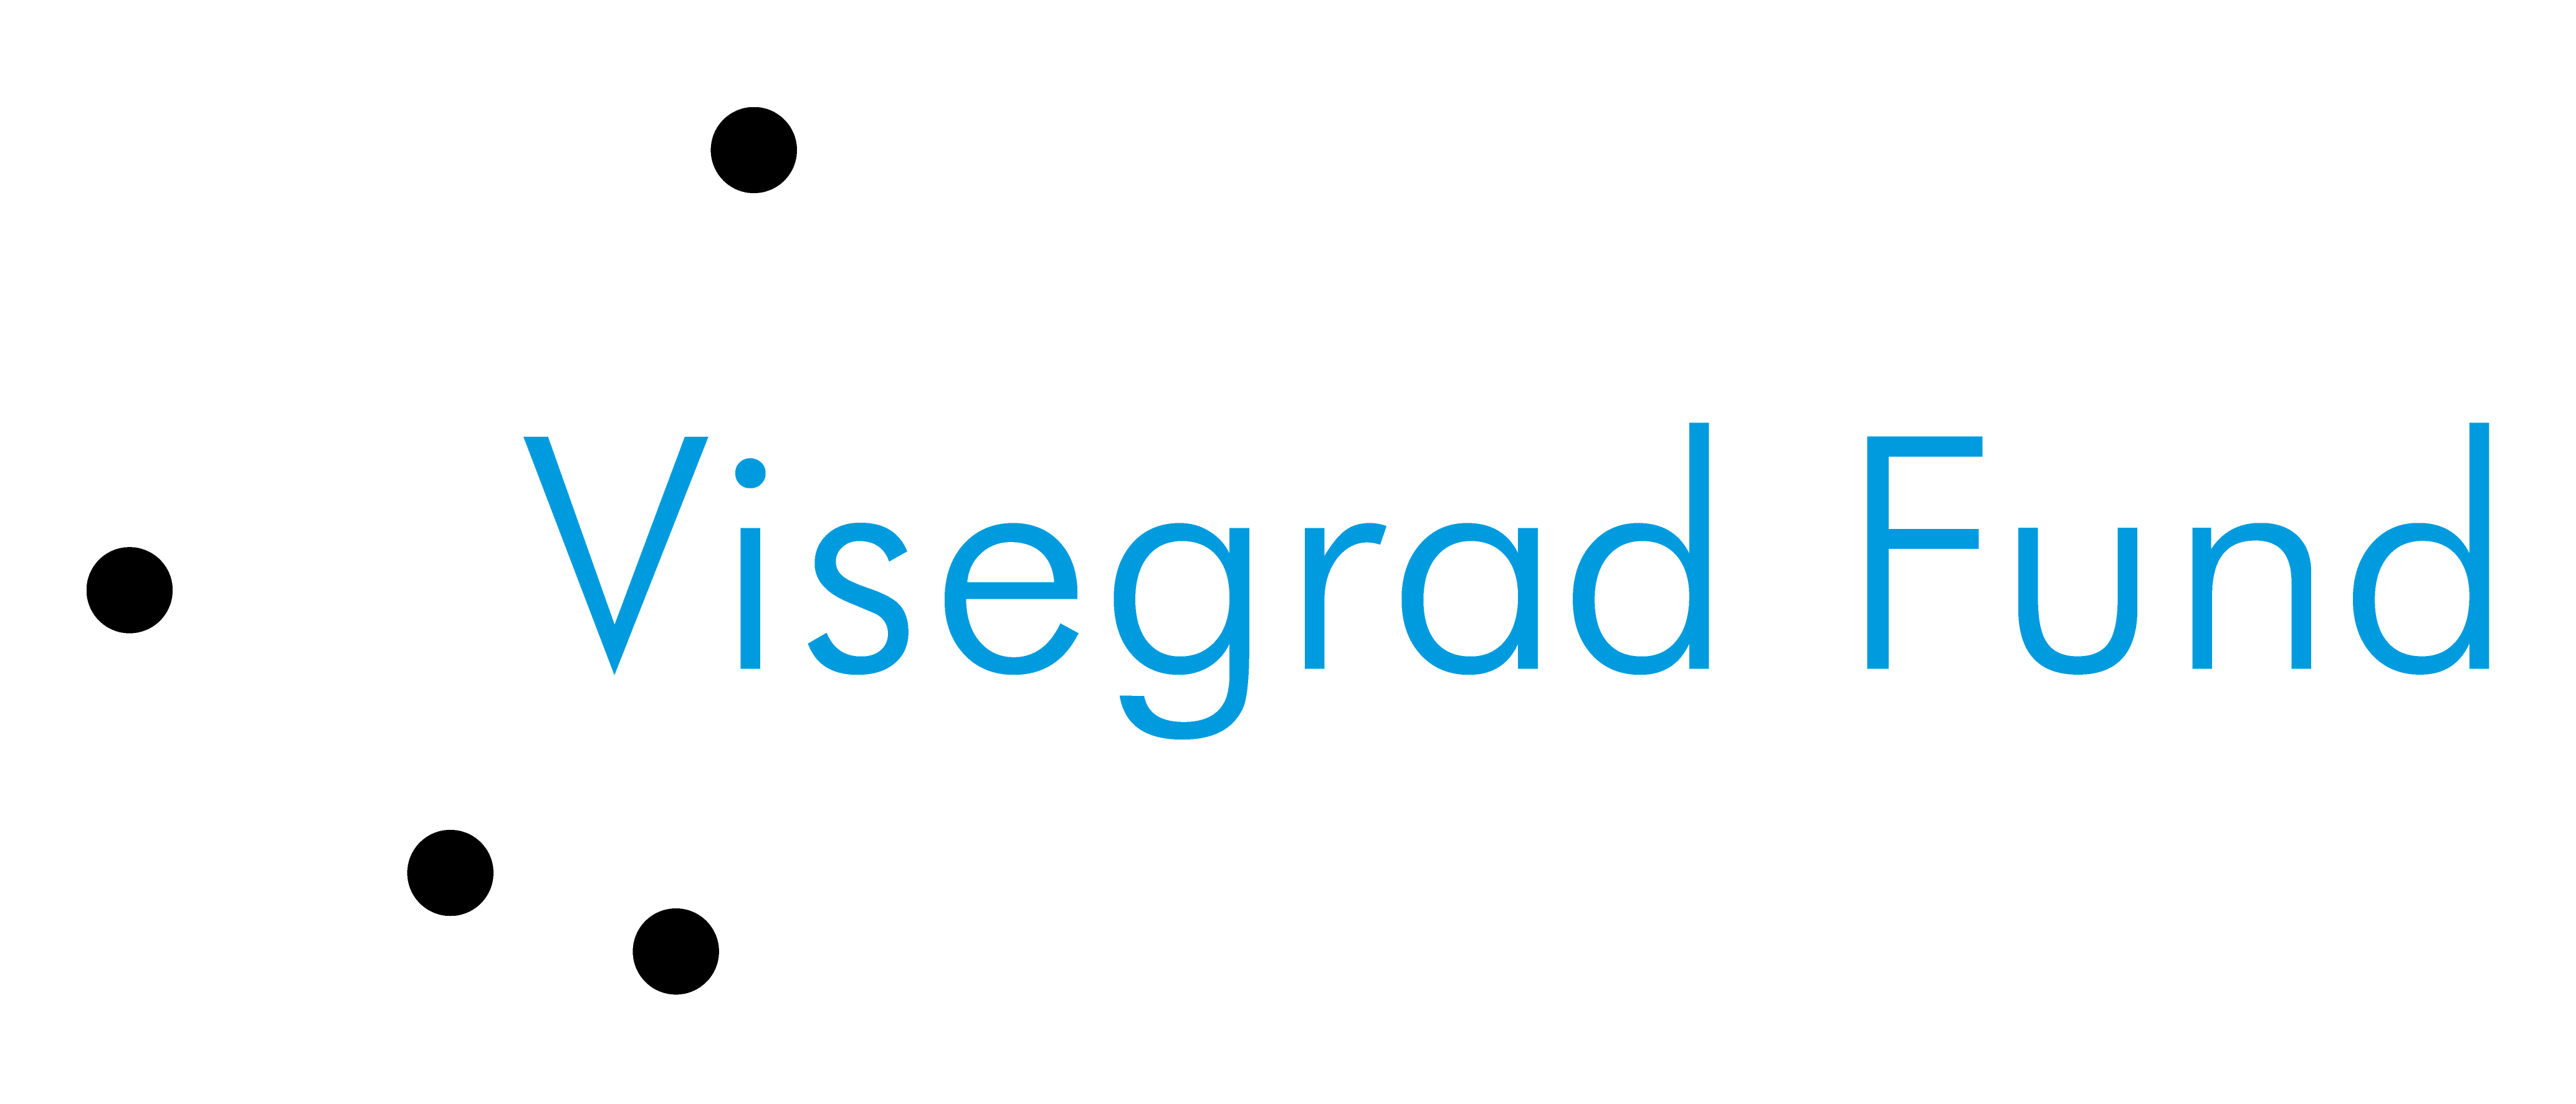 Apply for the 2014 Visegrad+ Western Balkans Grant Program. Win up to €80,000.